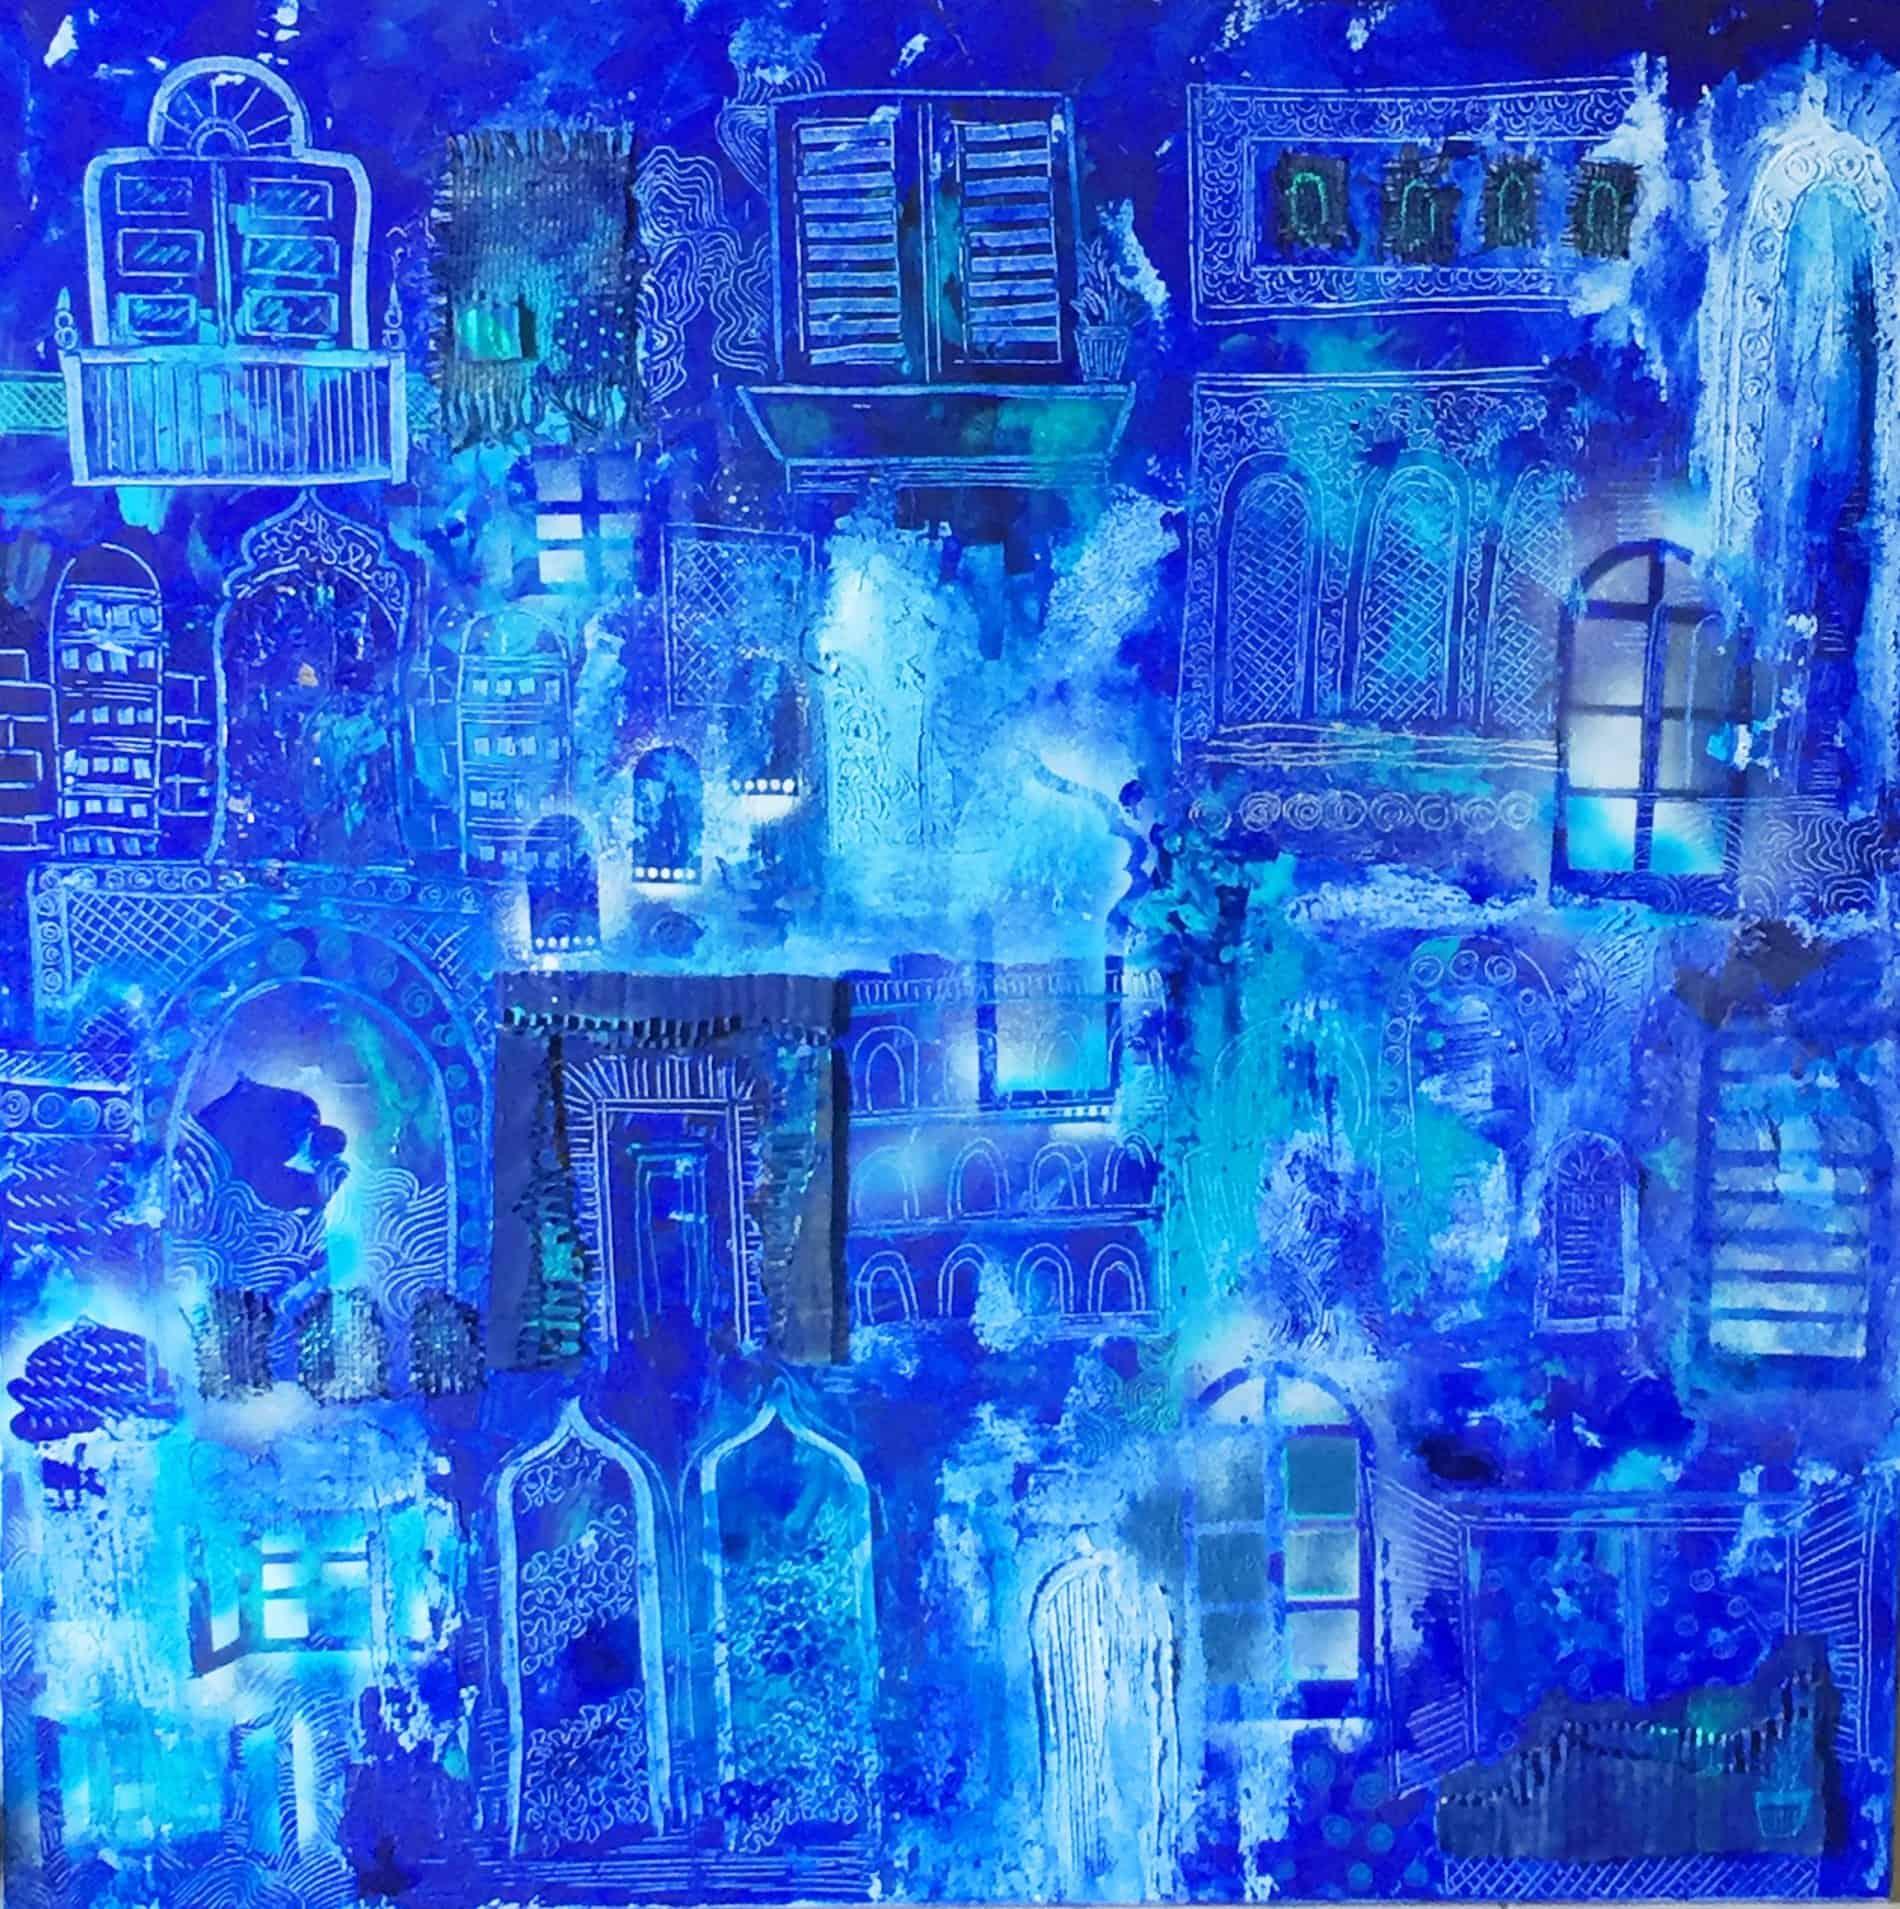 mauritius-arts-zahiirah-mutty-the-window-of-wisdom